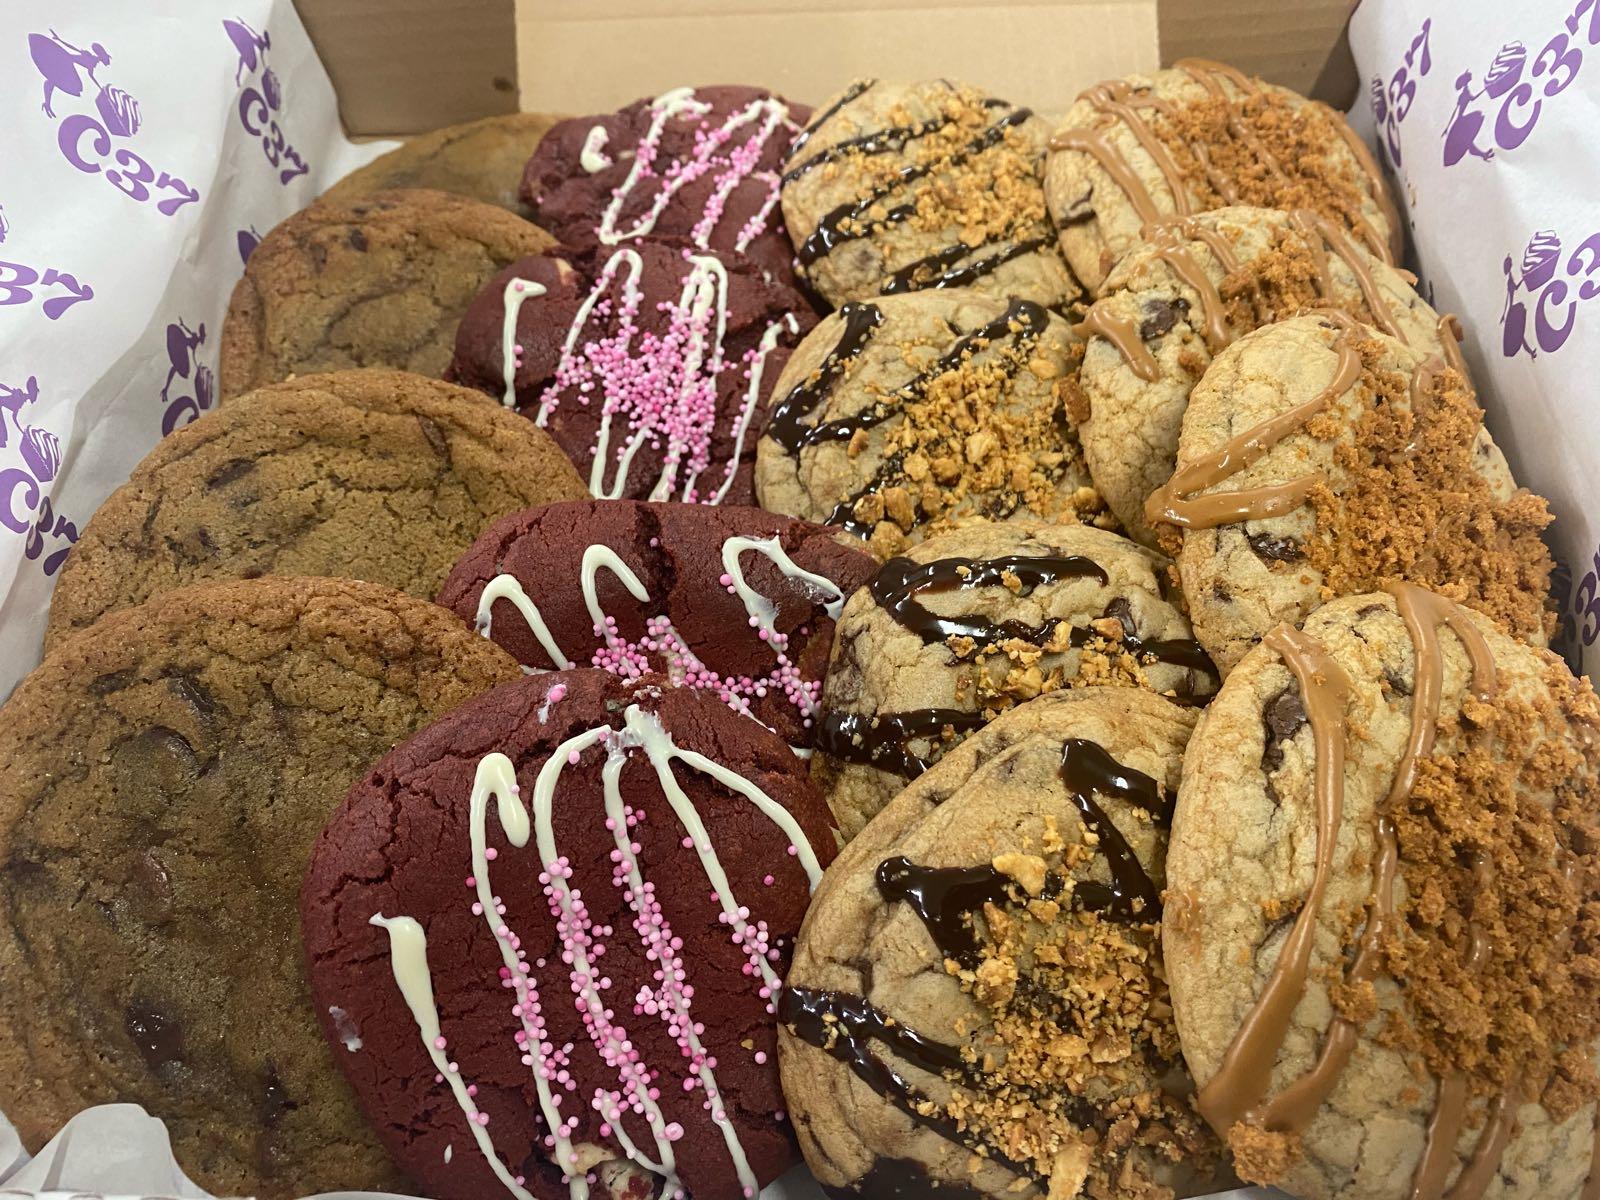 Box of stuffed cookies